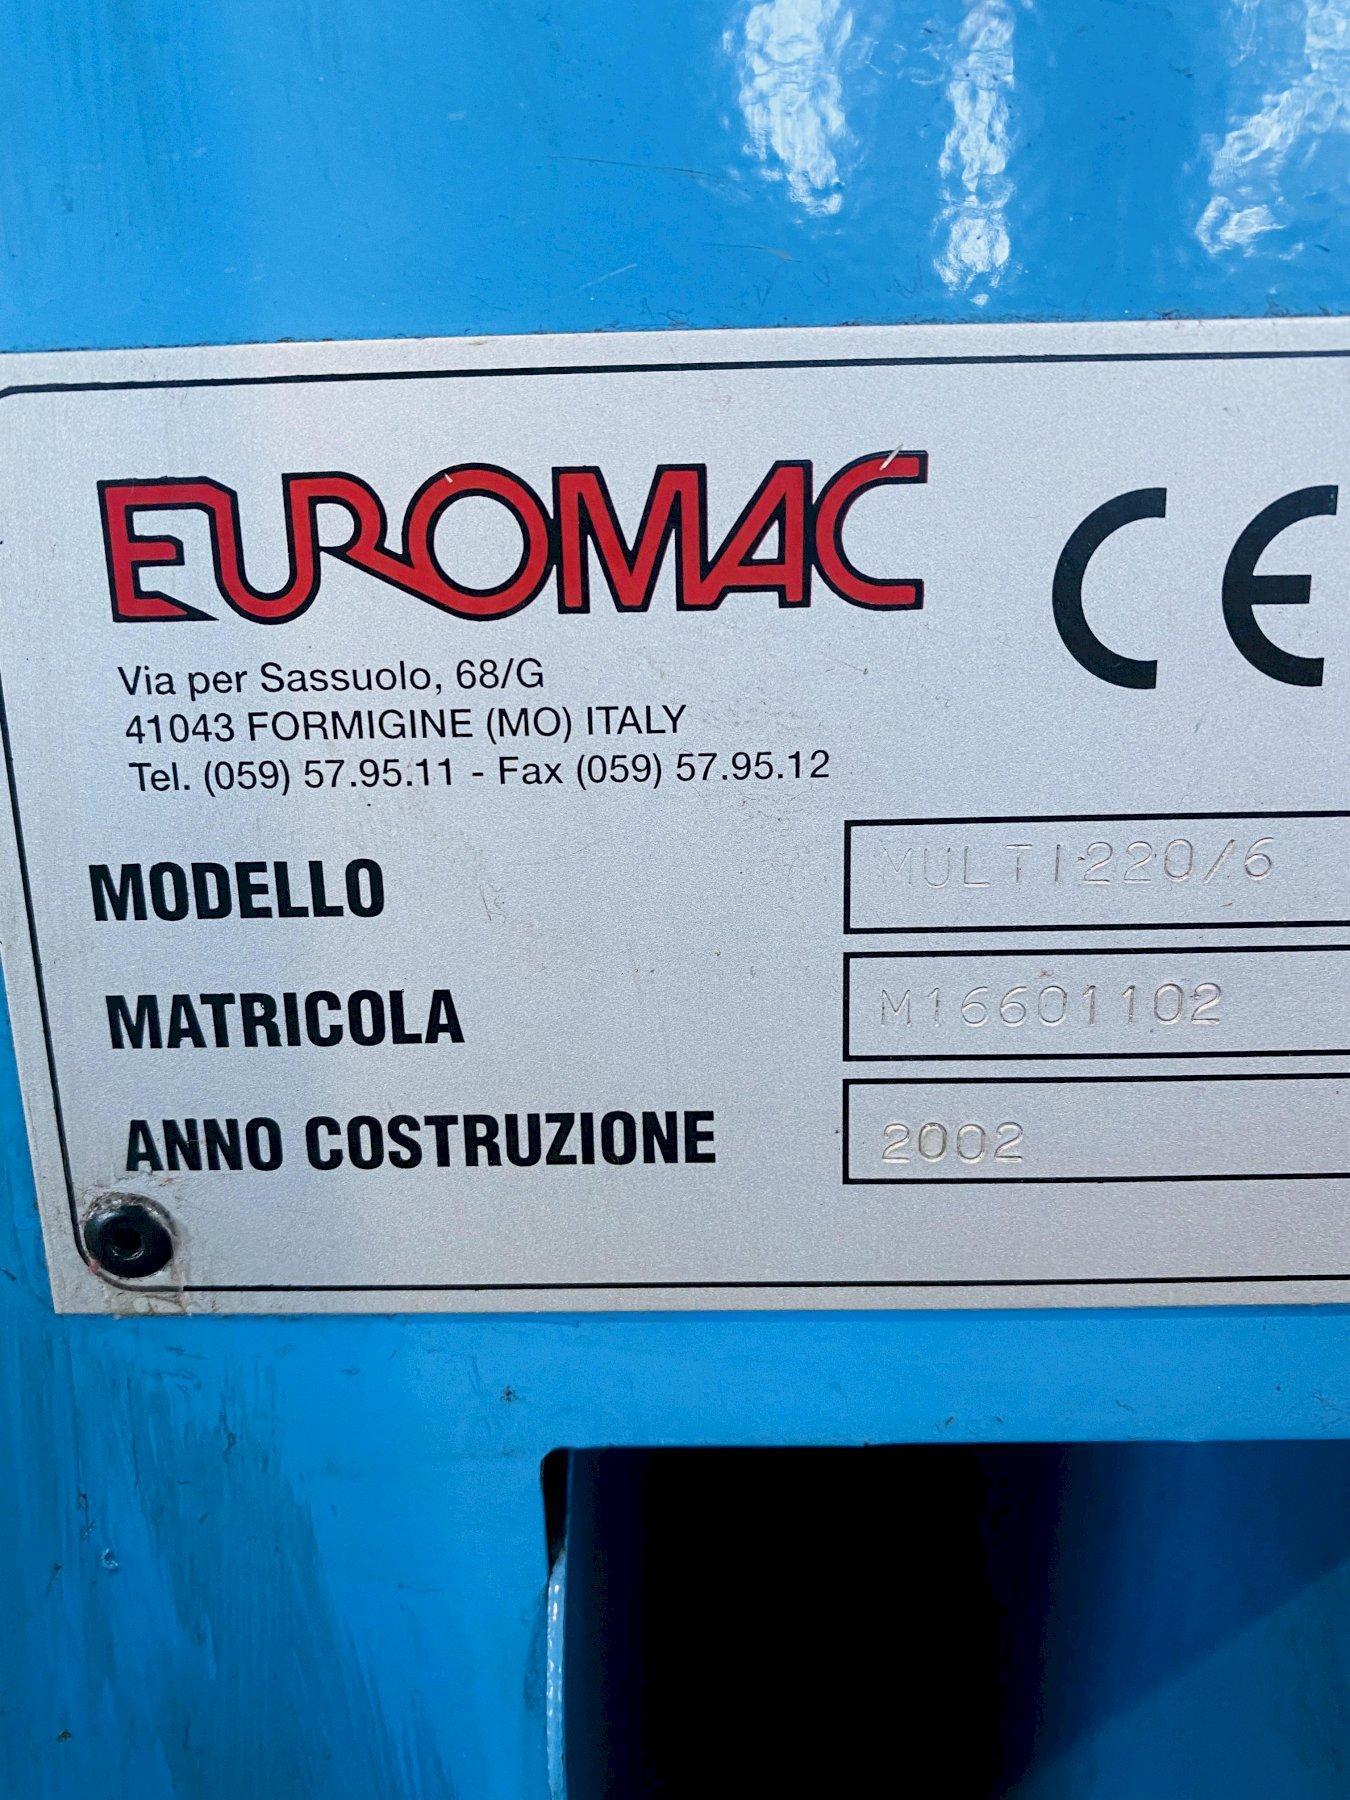 "7.87"" X 7.87"" X 1/4"" EUROMAC MULTI 220/6R HYDRAULIC NOTCHER. STOCK # 0612020"